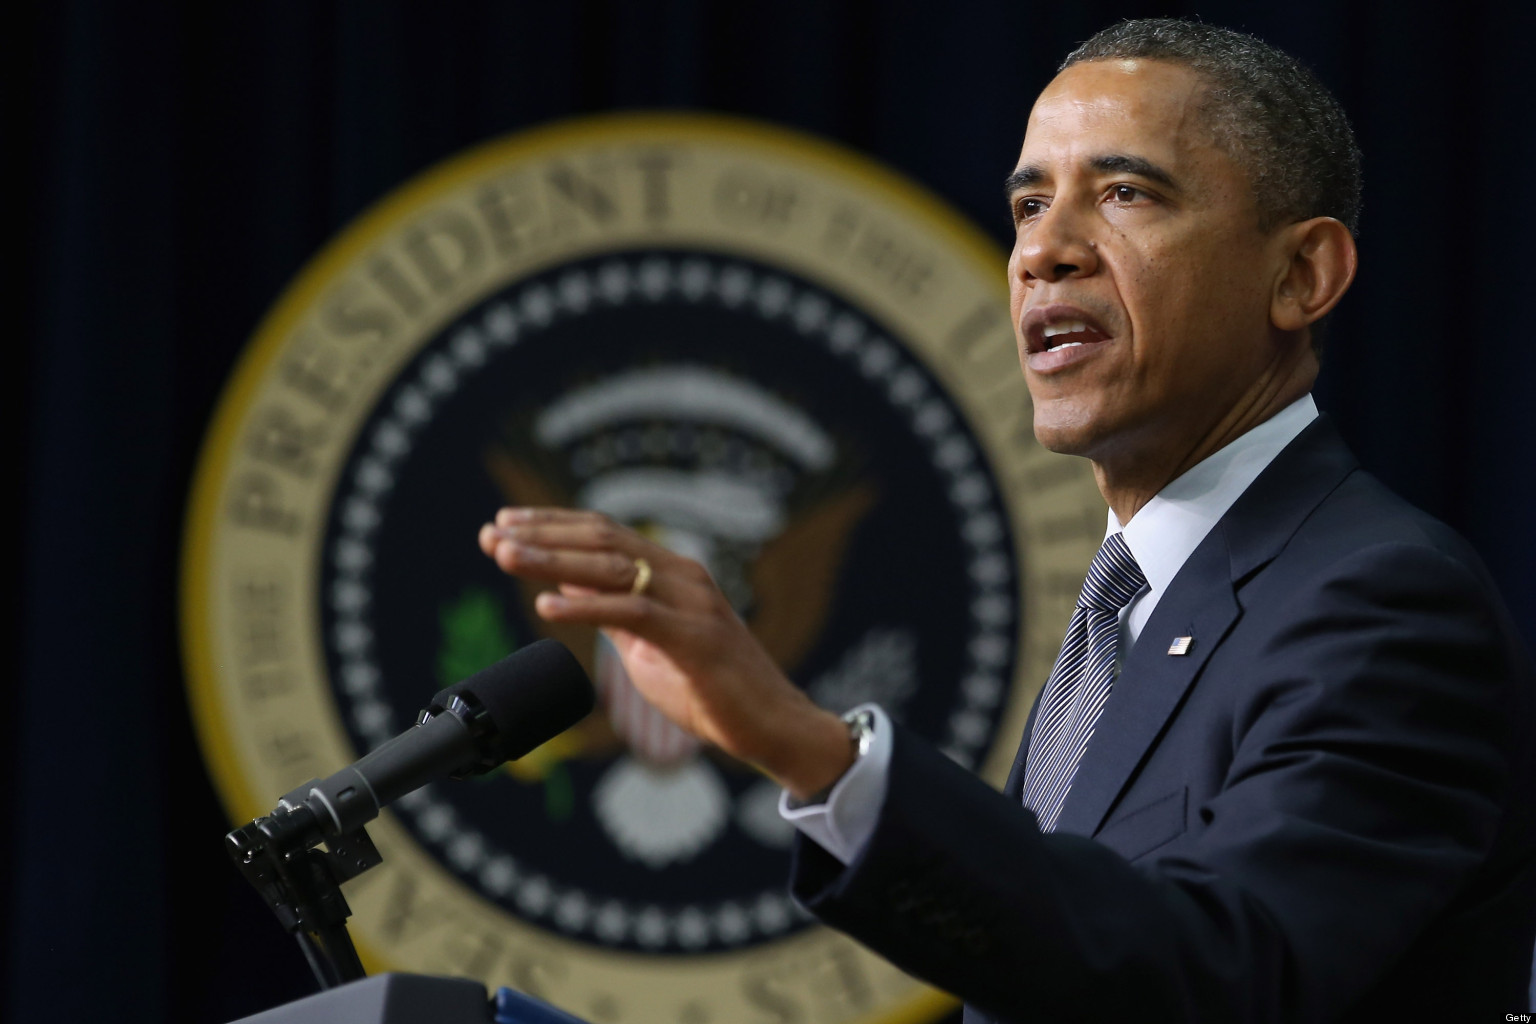 Obama calls for 'common-sense gun safety laws' after Florida school shooting